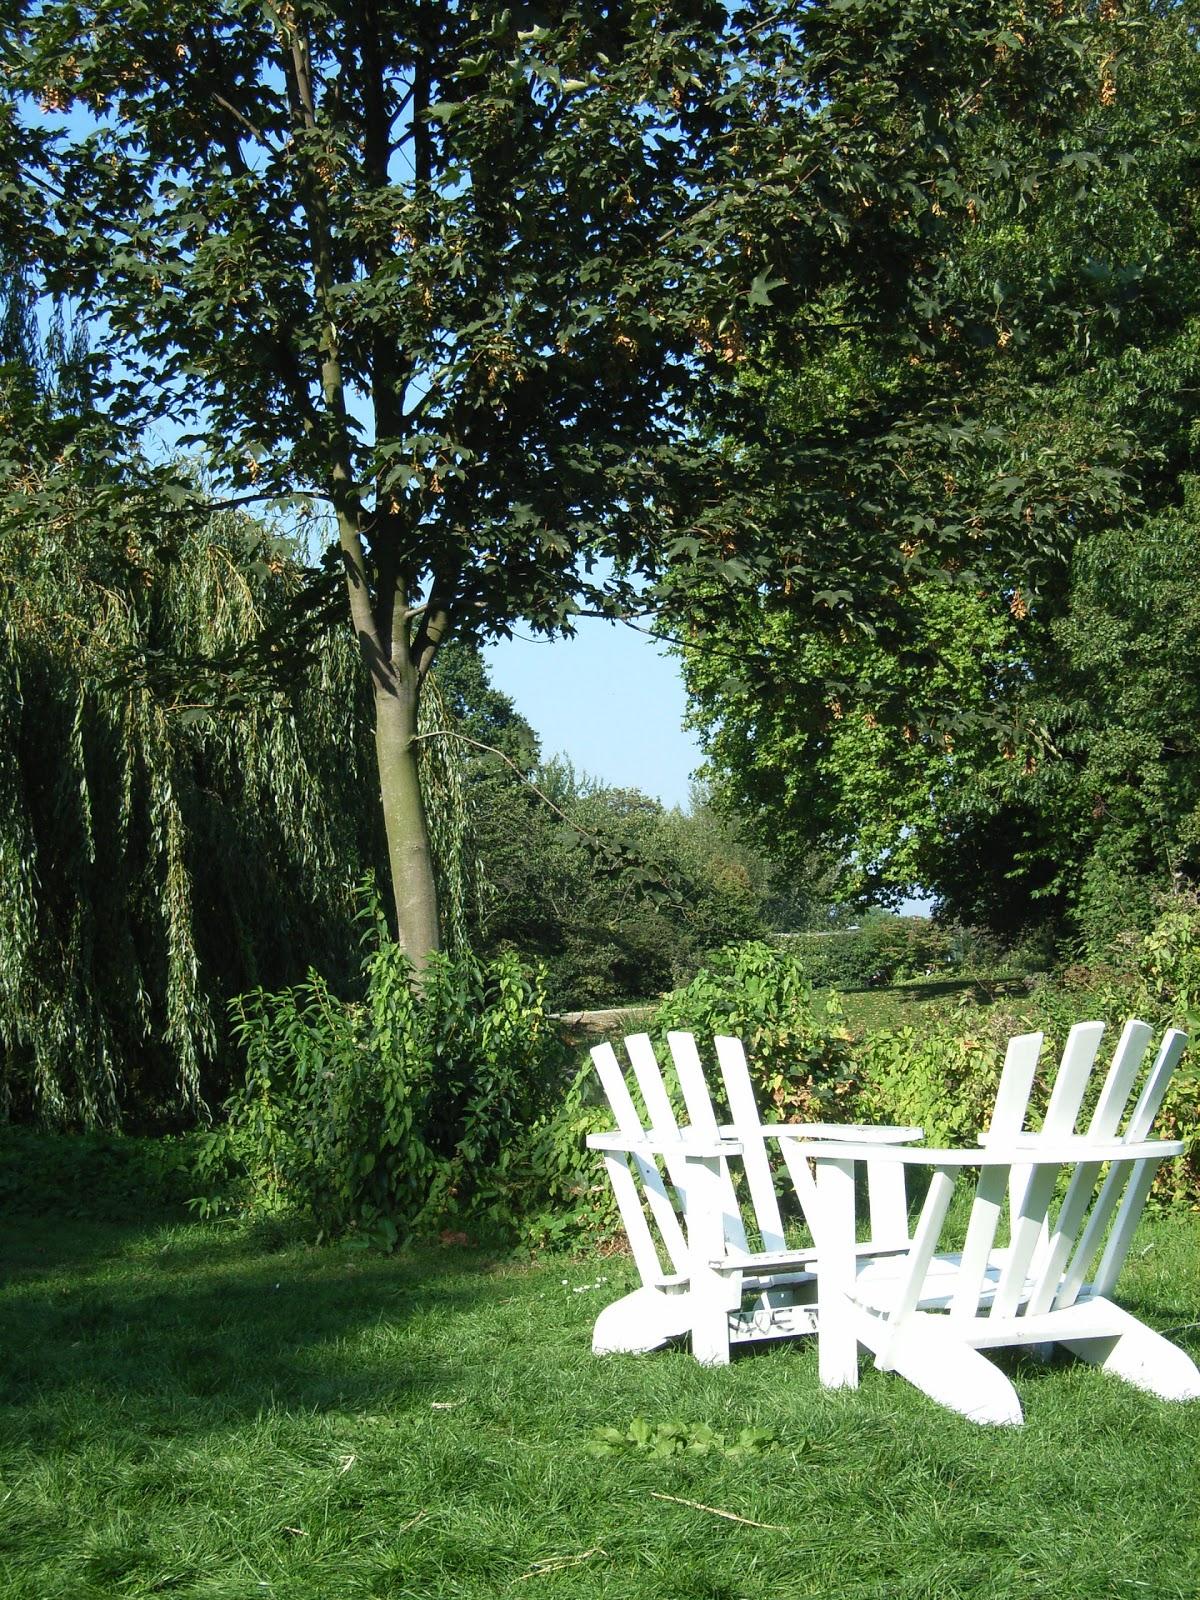 Park - Stühle - Bäume - Sommer